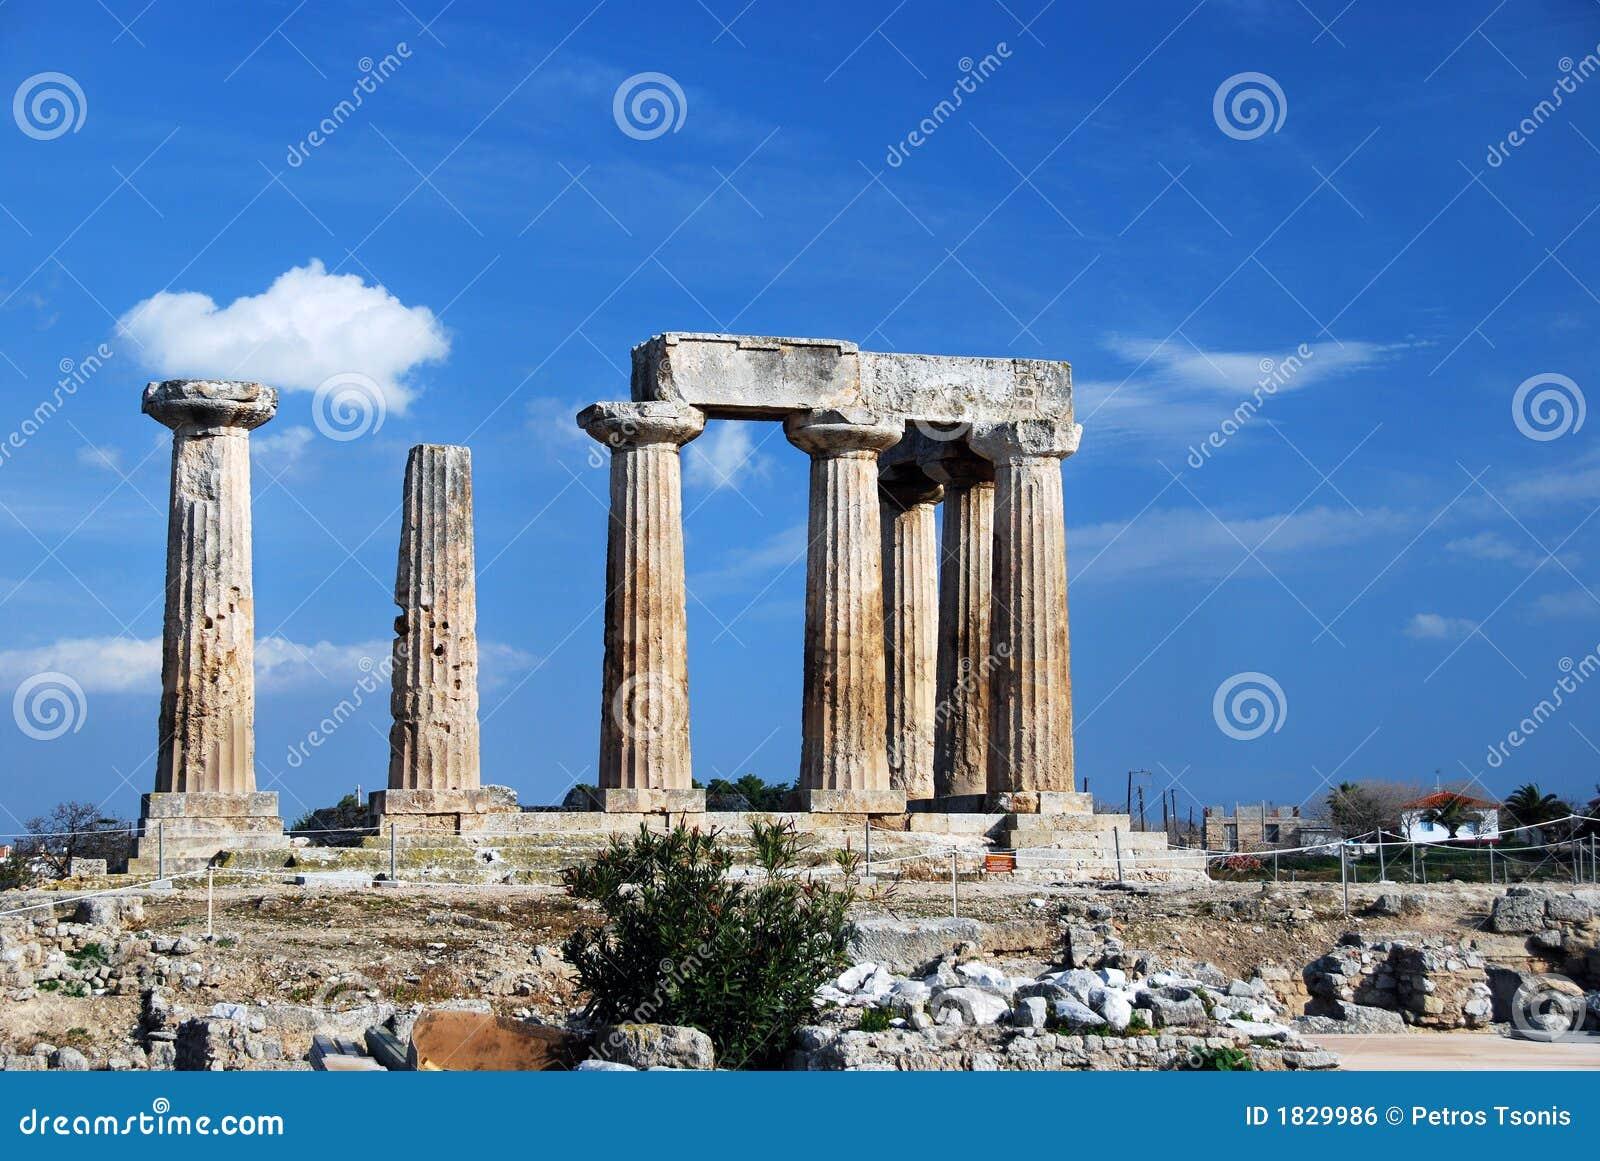 Ancient Greek Columns Royalty Free Stock Image - Image ...